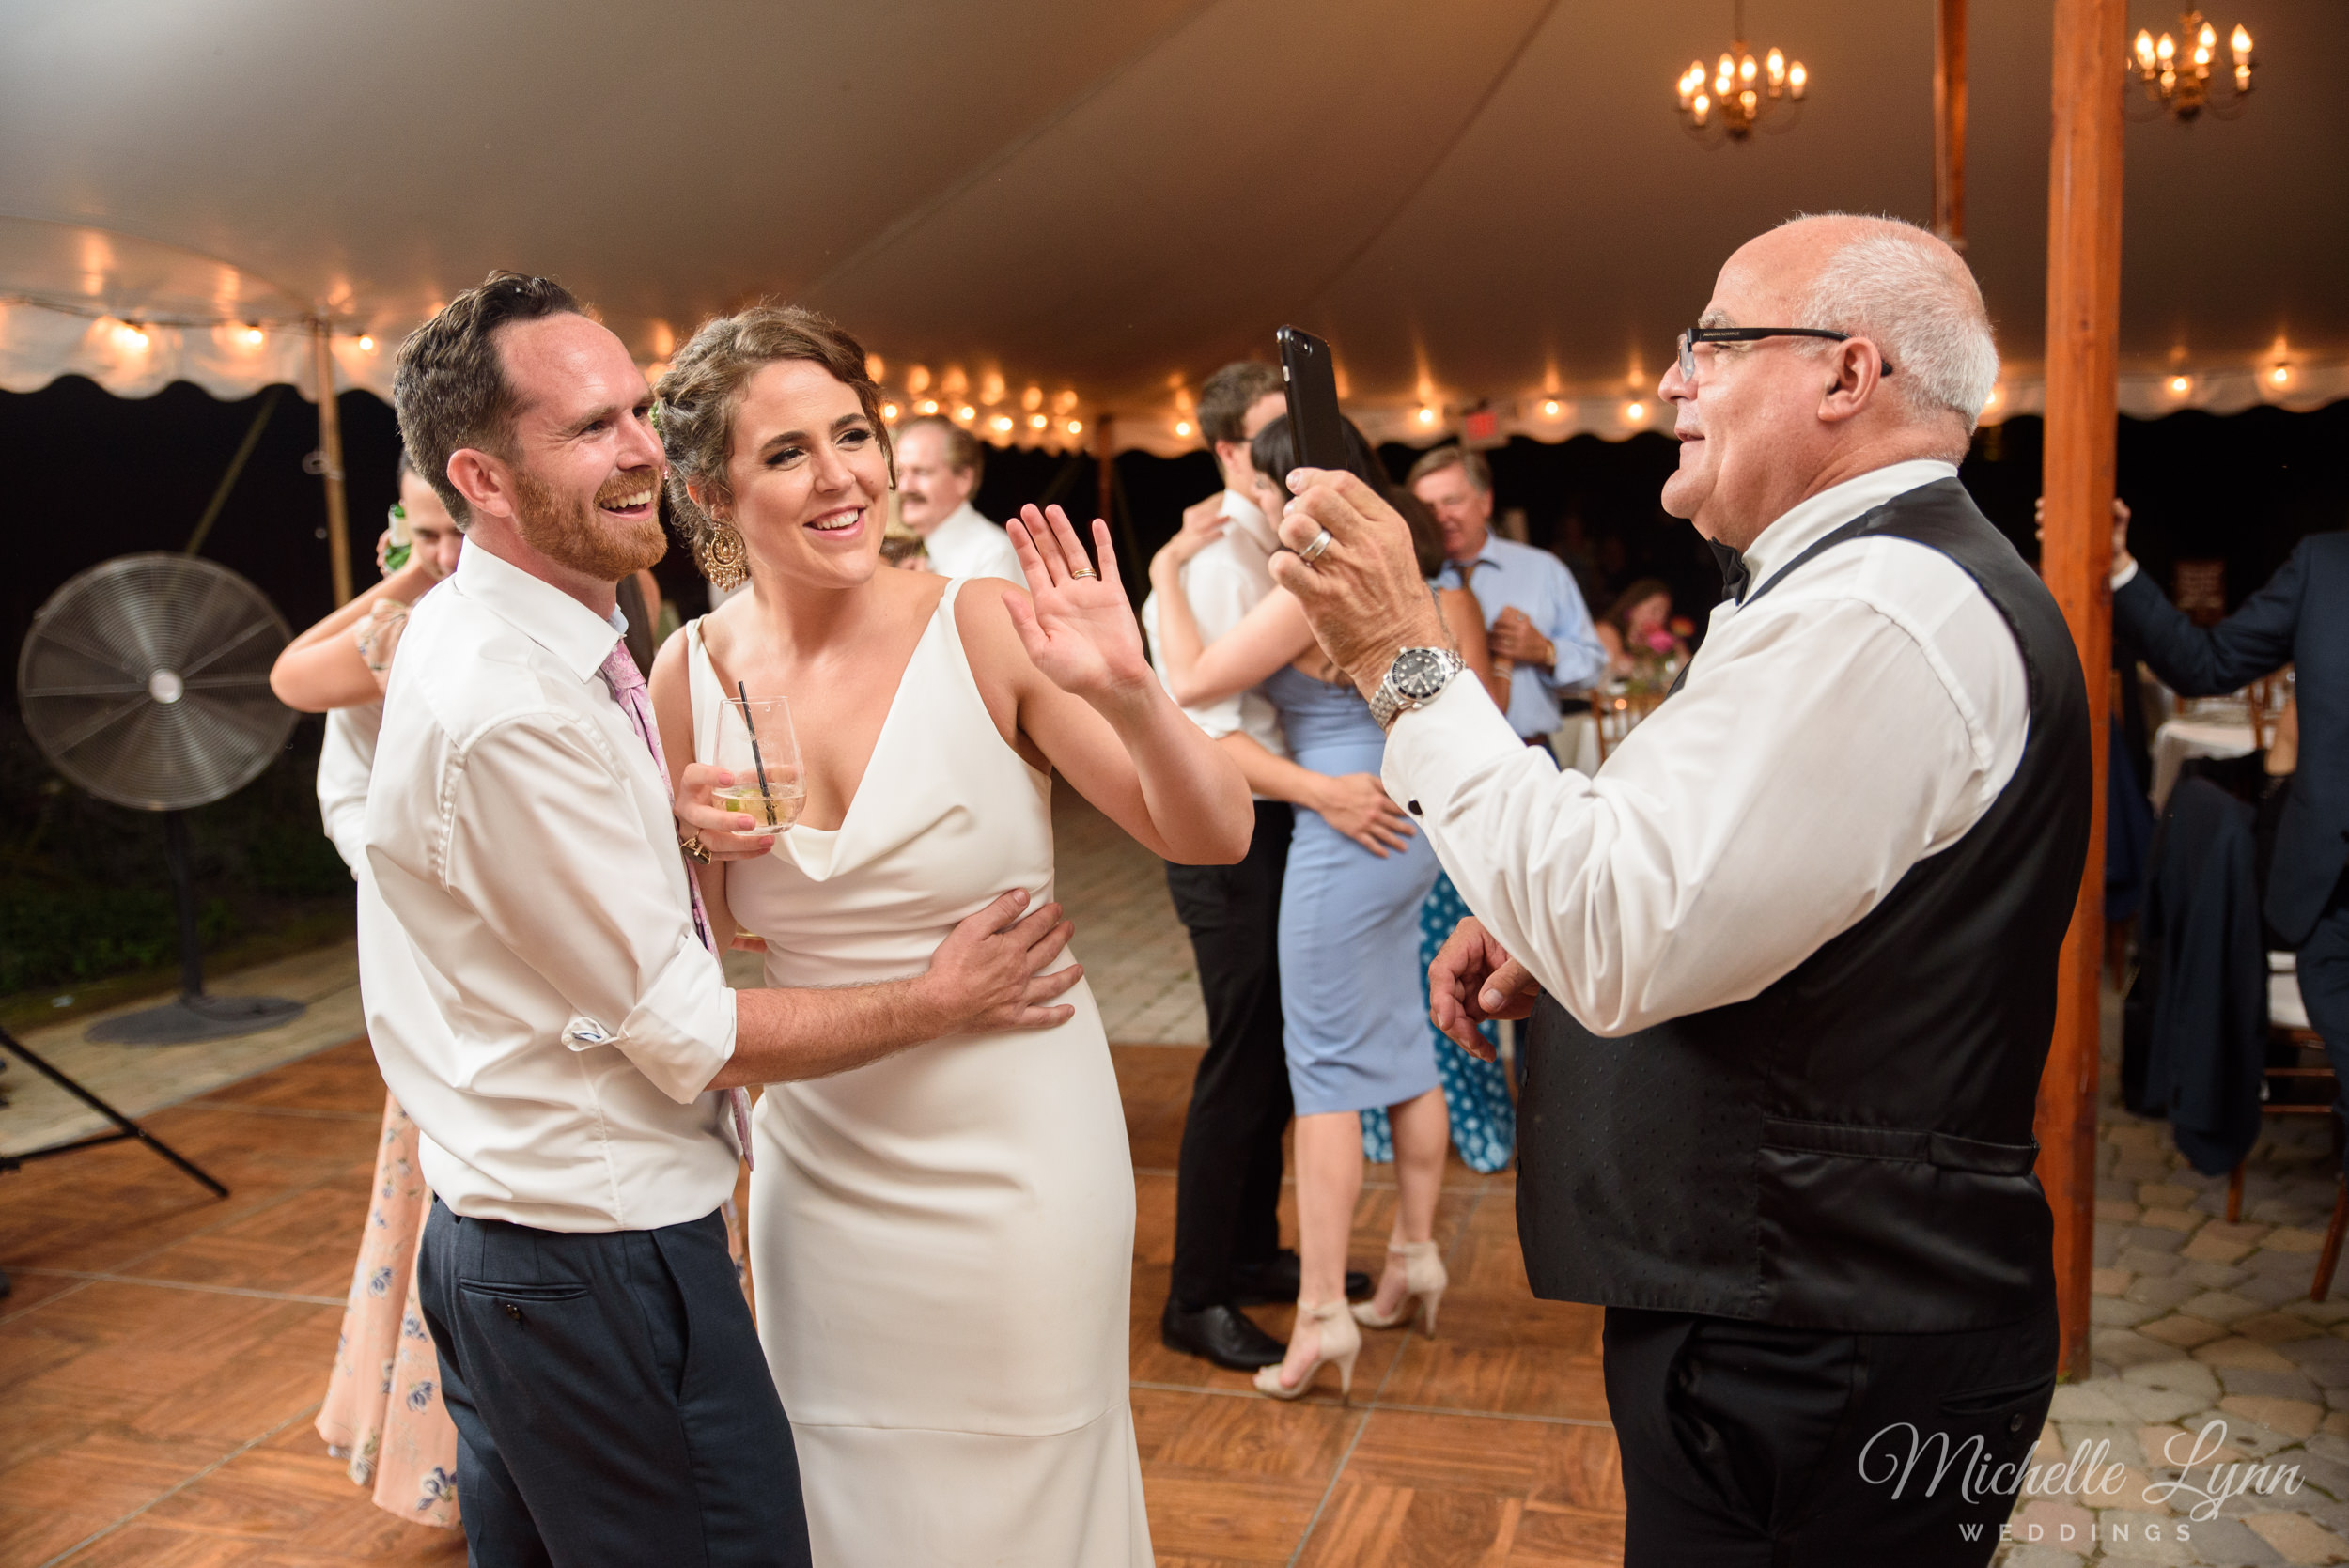 mlw-unionville-vineyards-nj-wedding-photography-107.jpg